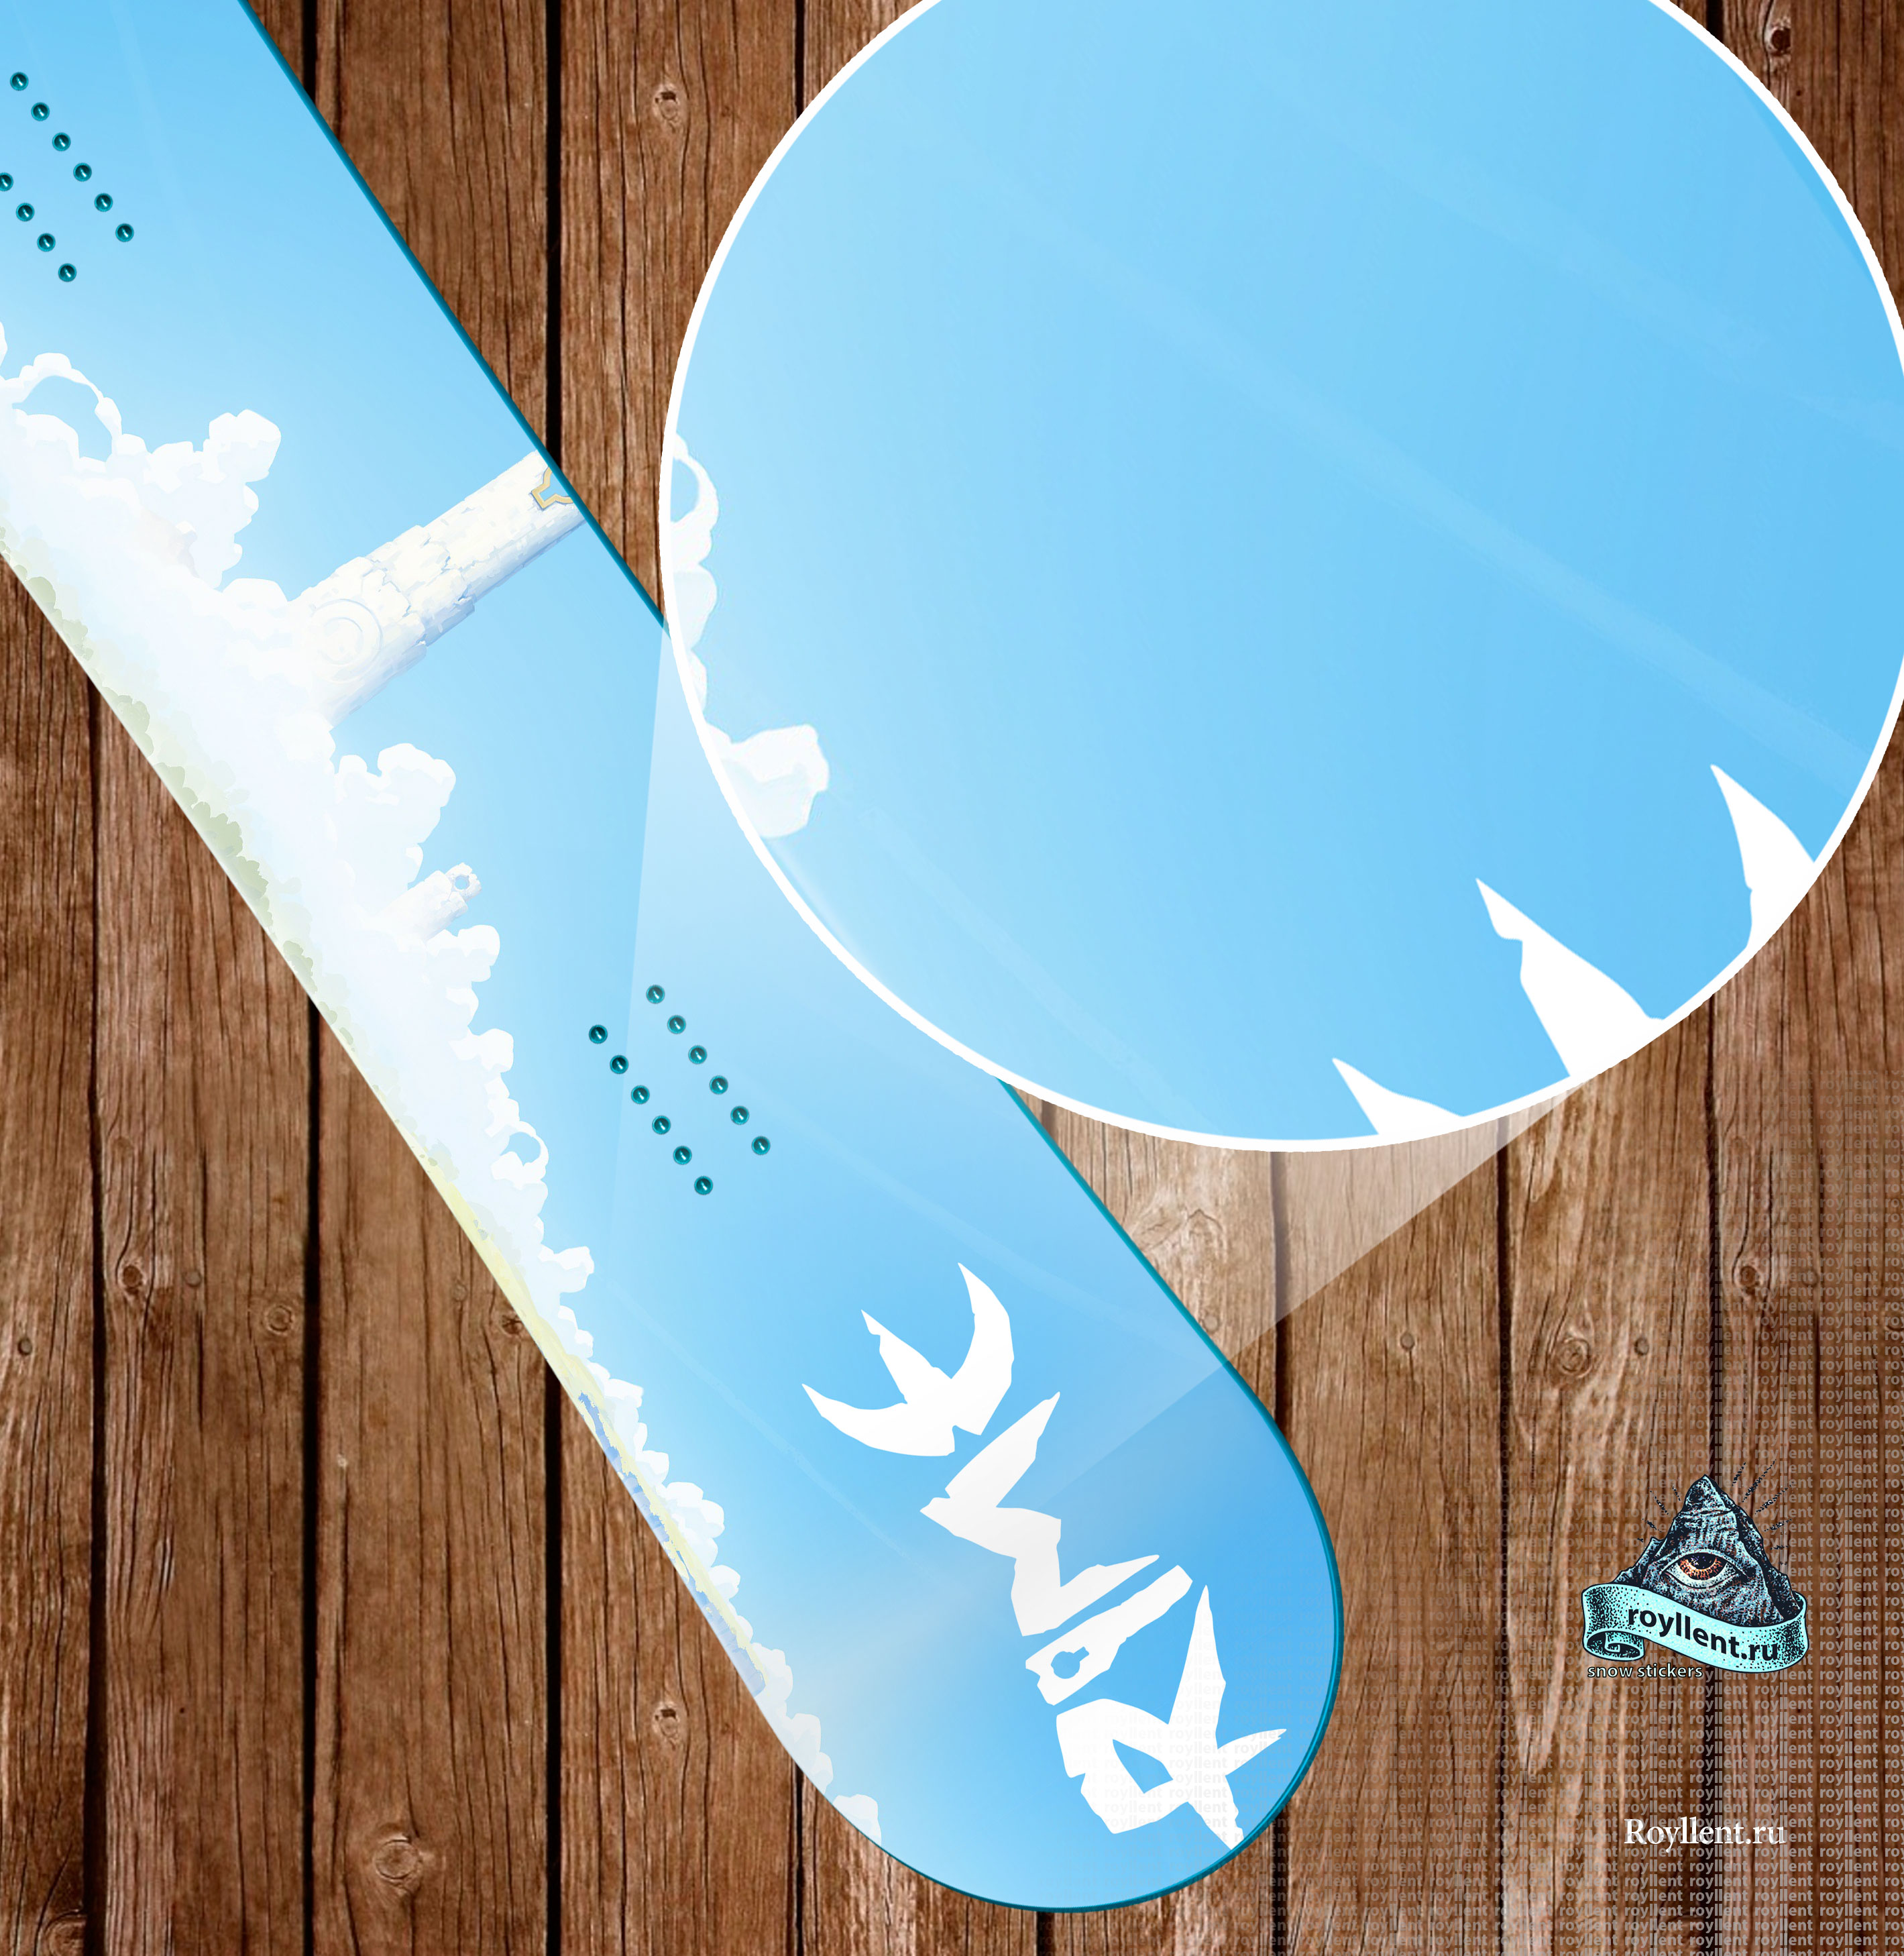 RiME, Наклейка RiME sticker, наклейка виниловая RiME, наклейка на доску RiME, сноуборд наклейка RiME, виниловый стикер RiME, магазин наклеек RiME, купить наклейку RiME, стикер RiME, sticker RiME, наклейка, Полноразмерная наклейка на сноуборд, спб RiME